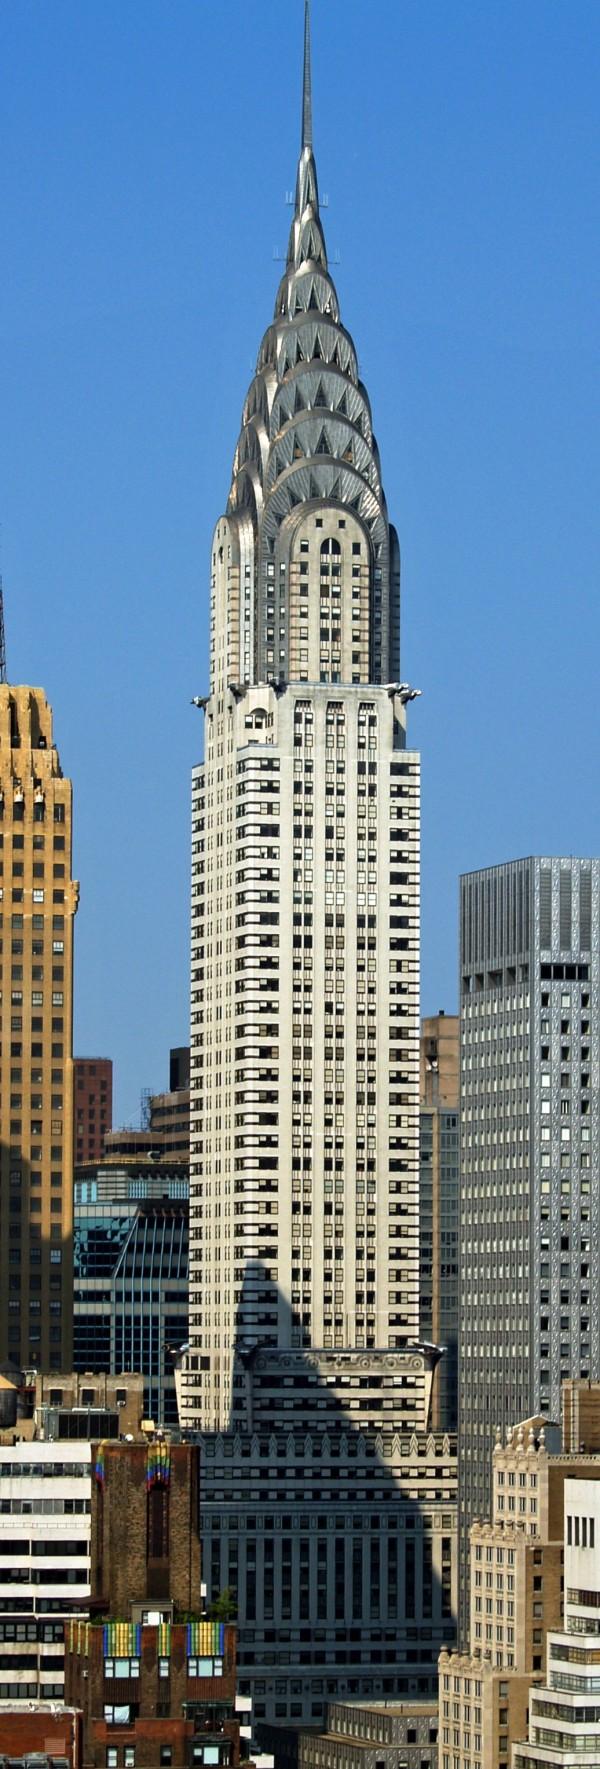 Chrysler_Building_by_David_Shankbone_Retouched